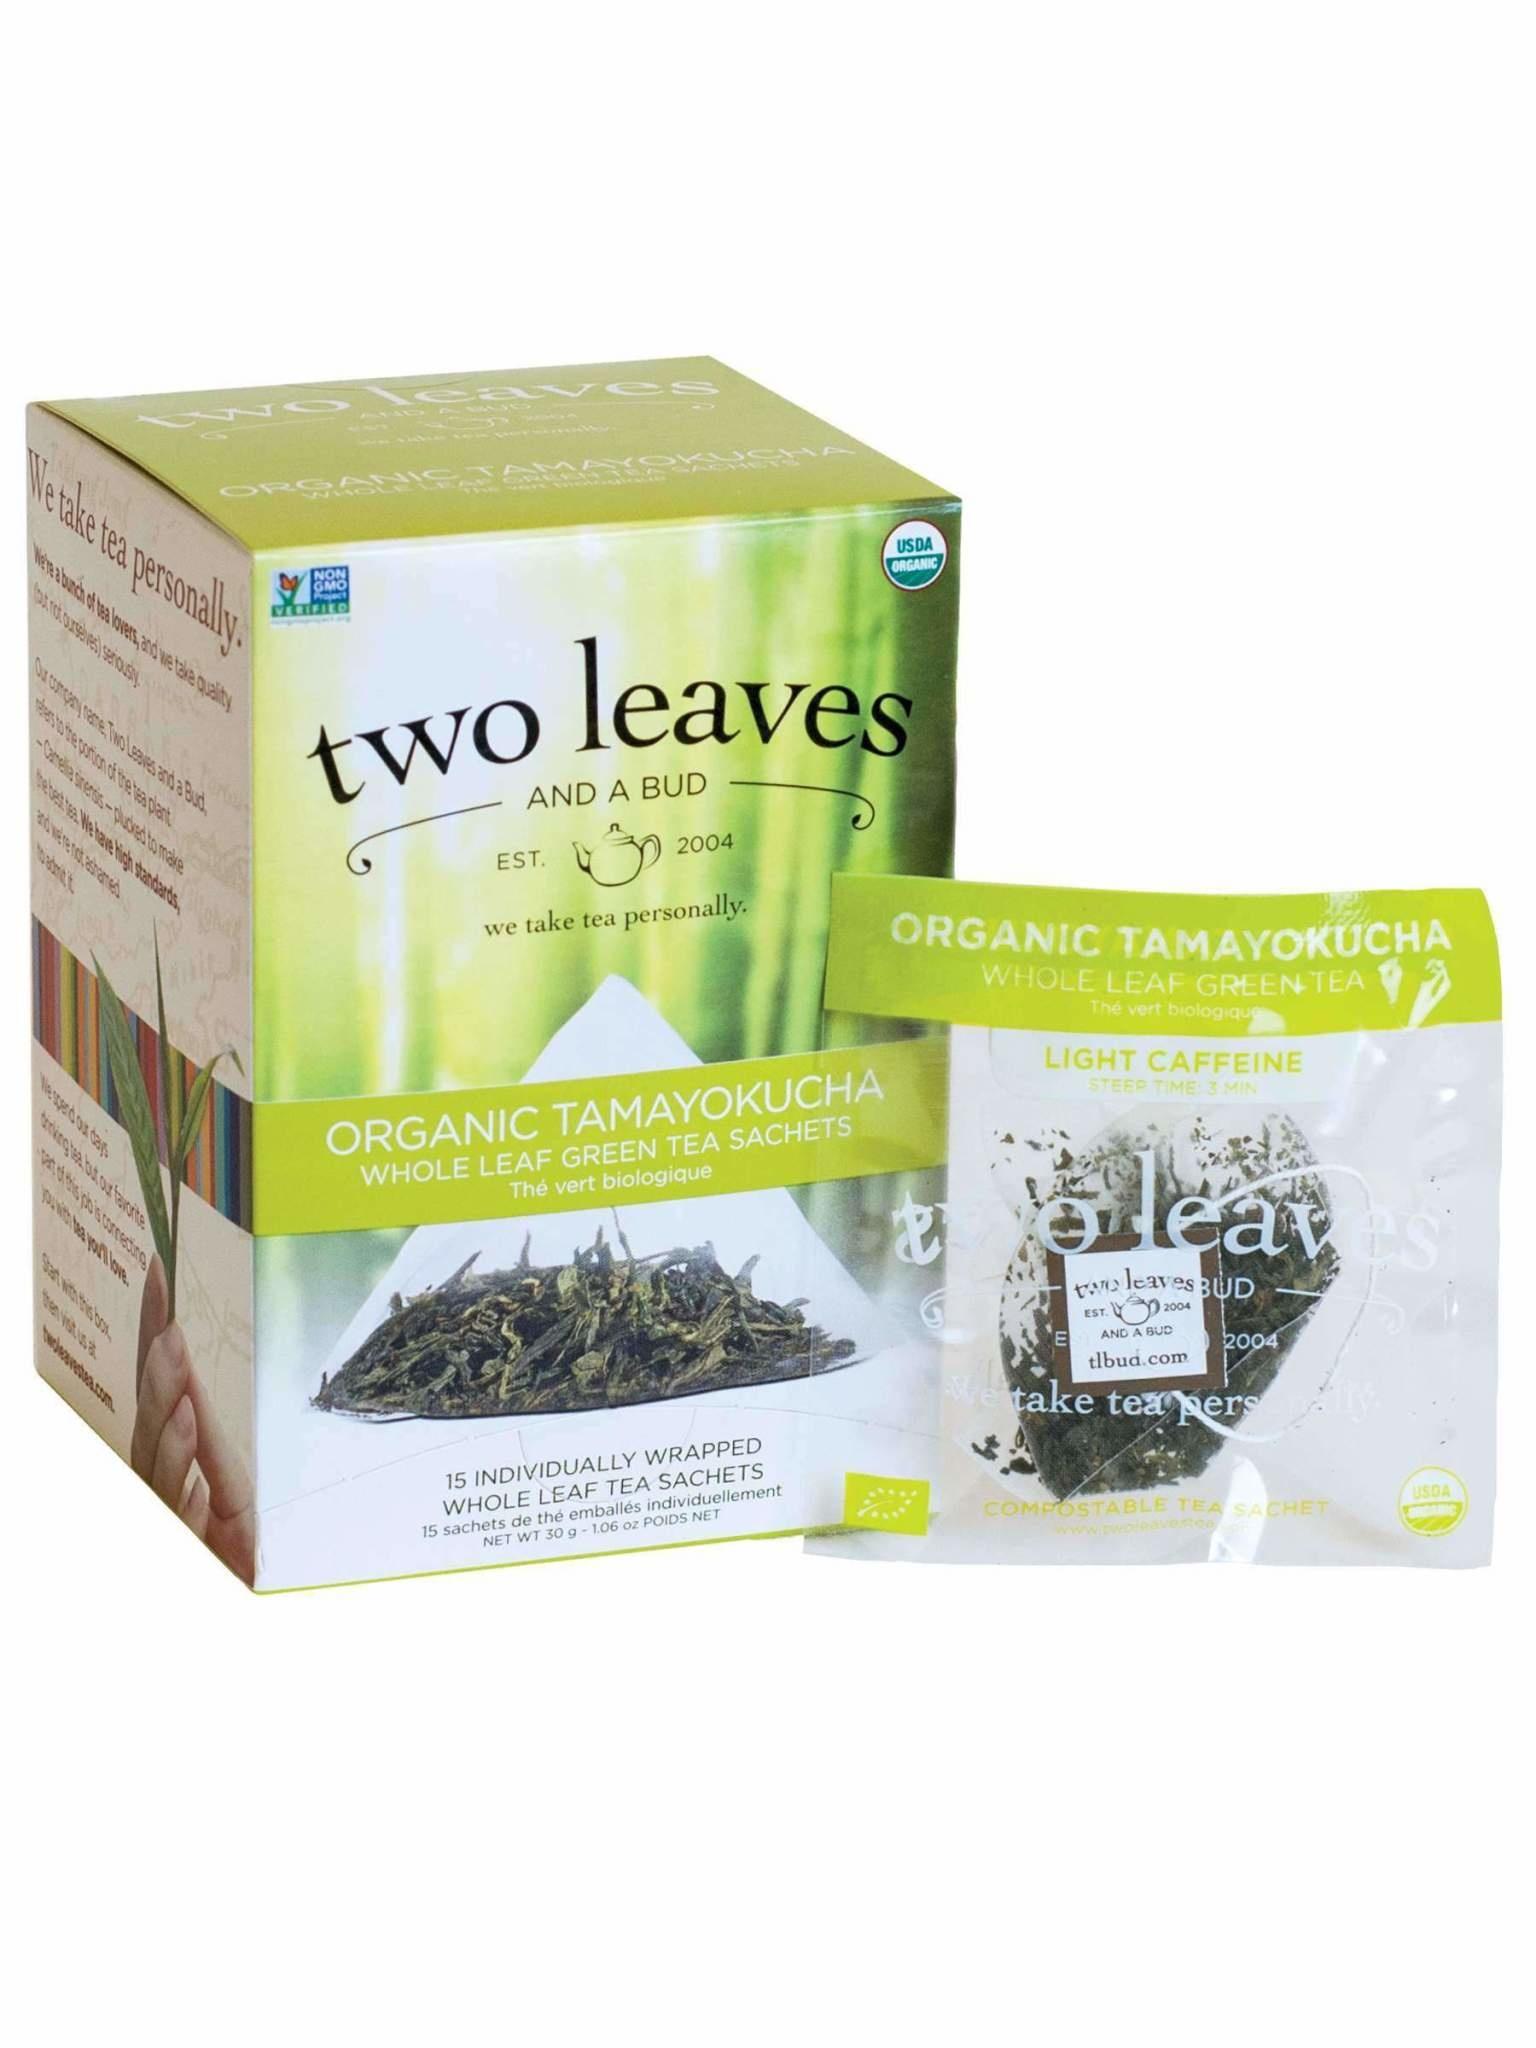 Two Leaves and a bud-Organic Tamayokucha Whole leaf green tea sachets-1